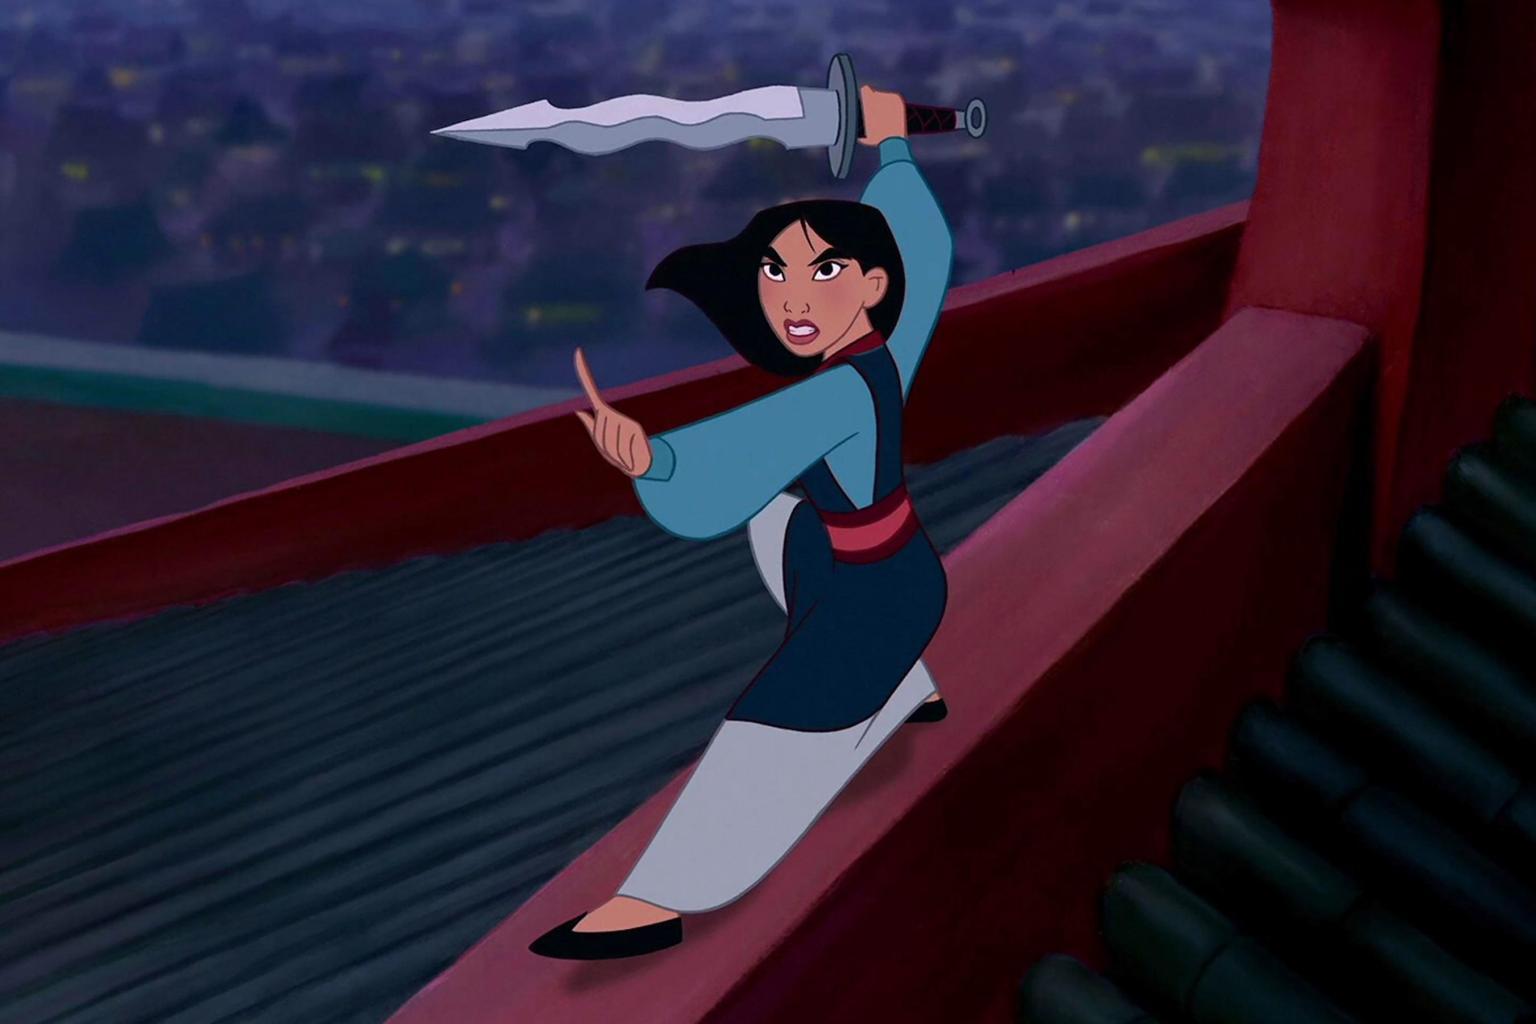 Disney       's Live-Action Mulan to Be        Girly Martial Arts Extravaganza,      '  Director Says